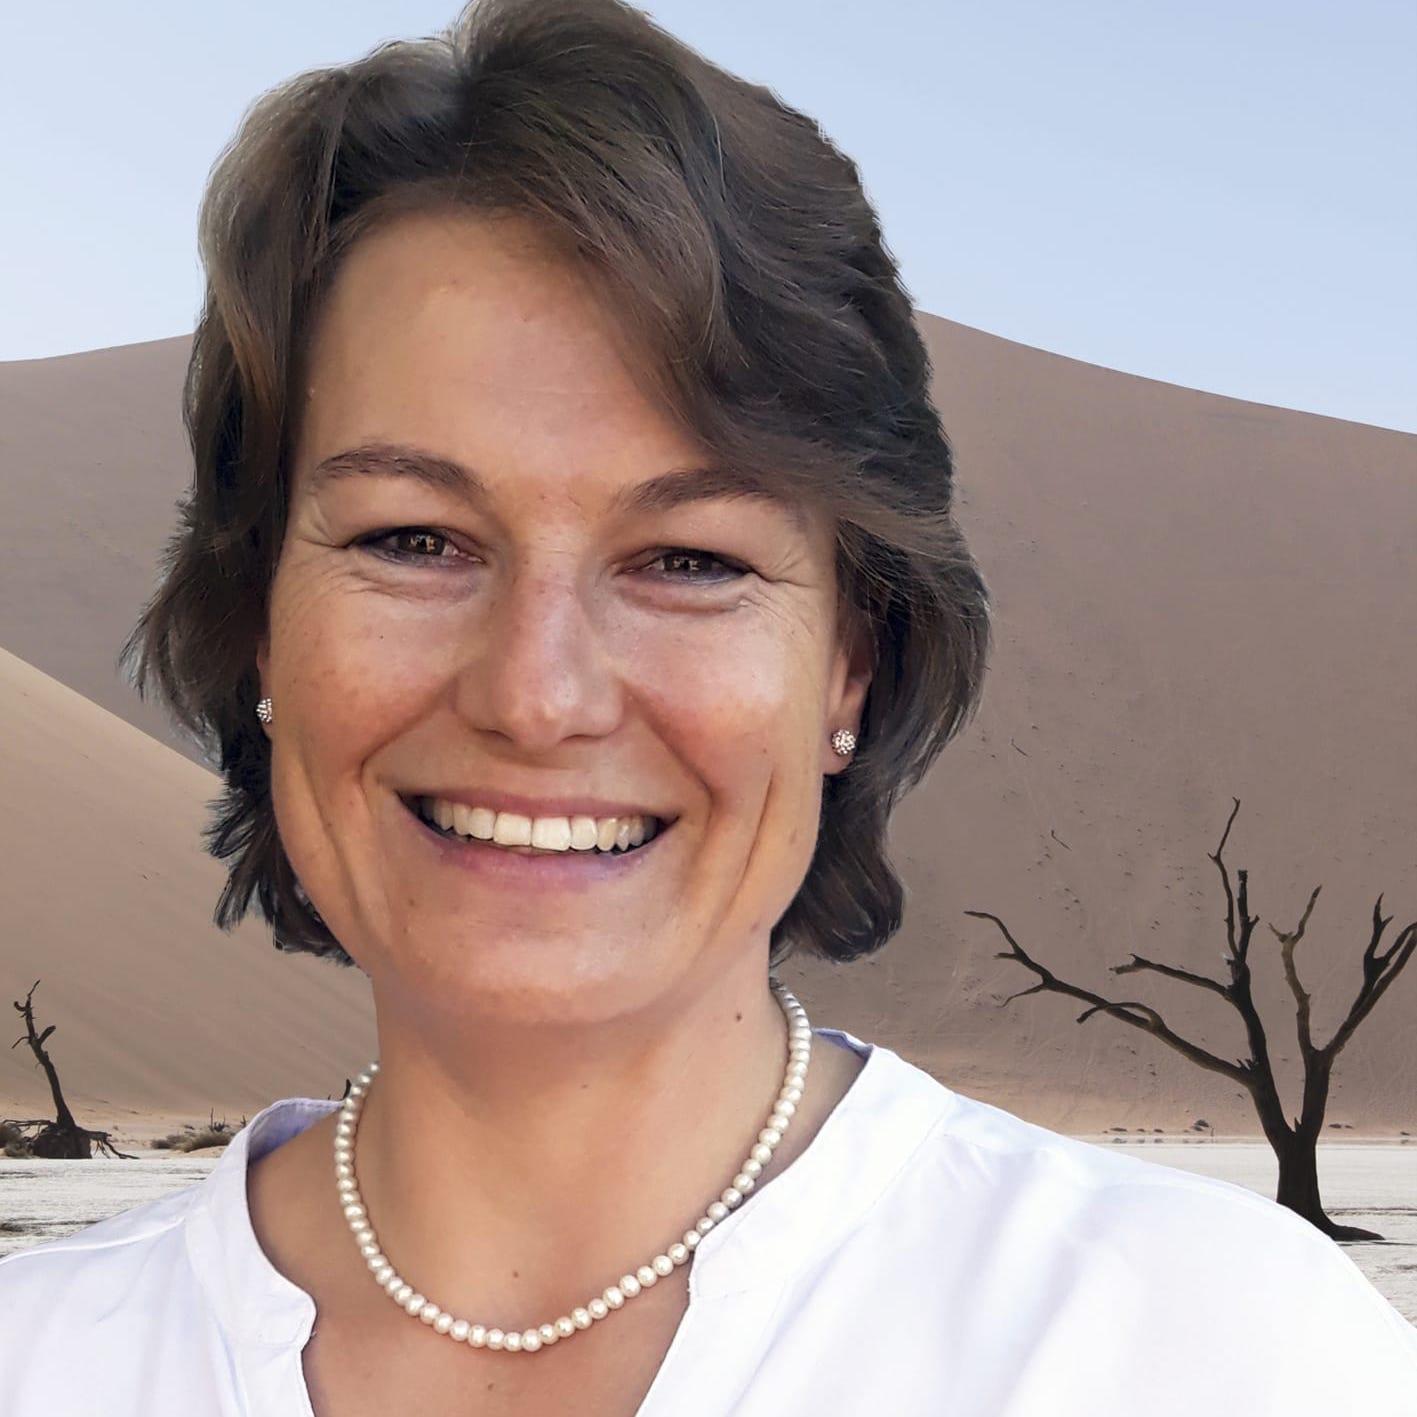 Karen Powell Money On Purpose Testimonial_Tanya Förtsch